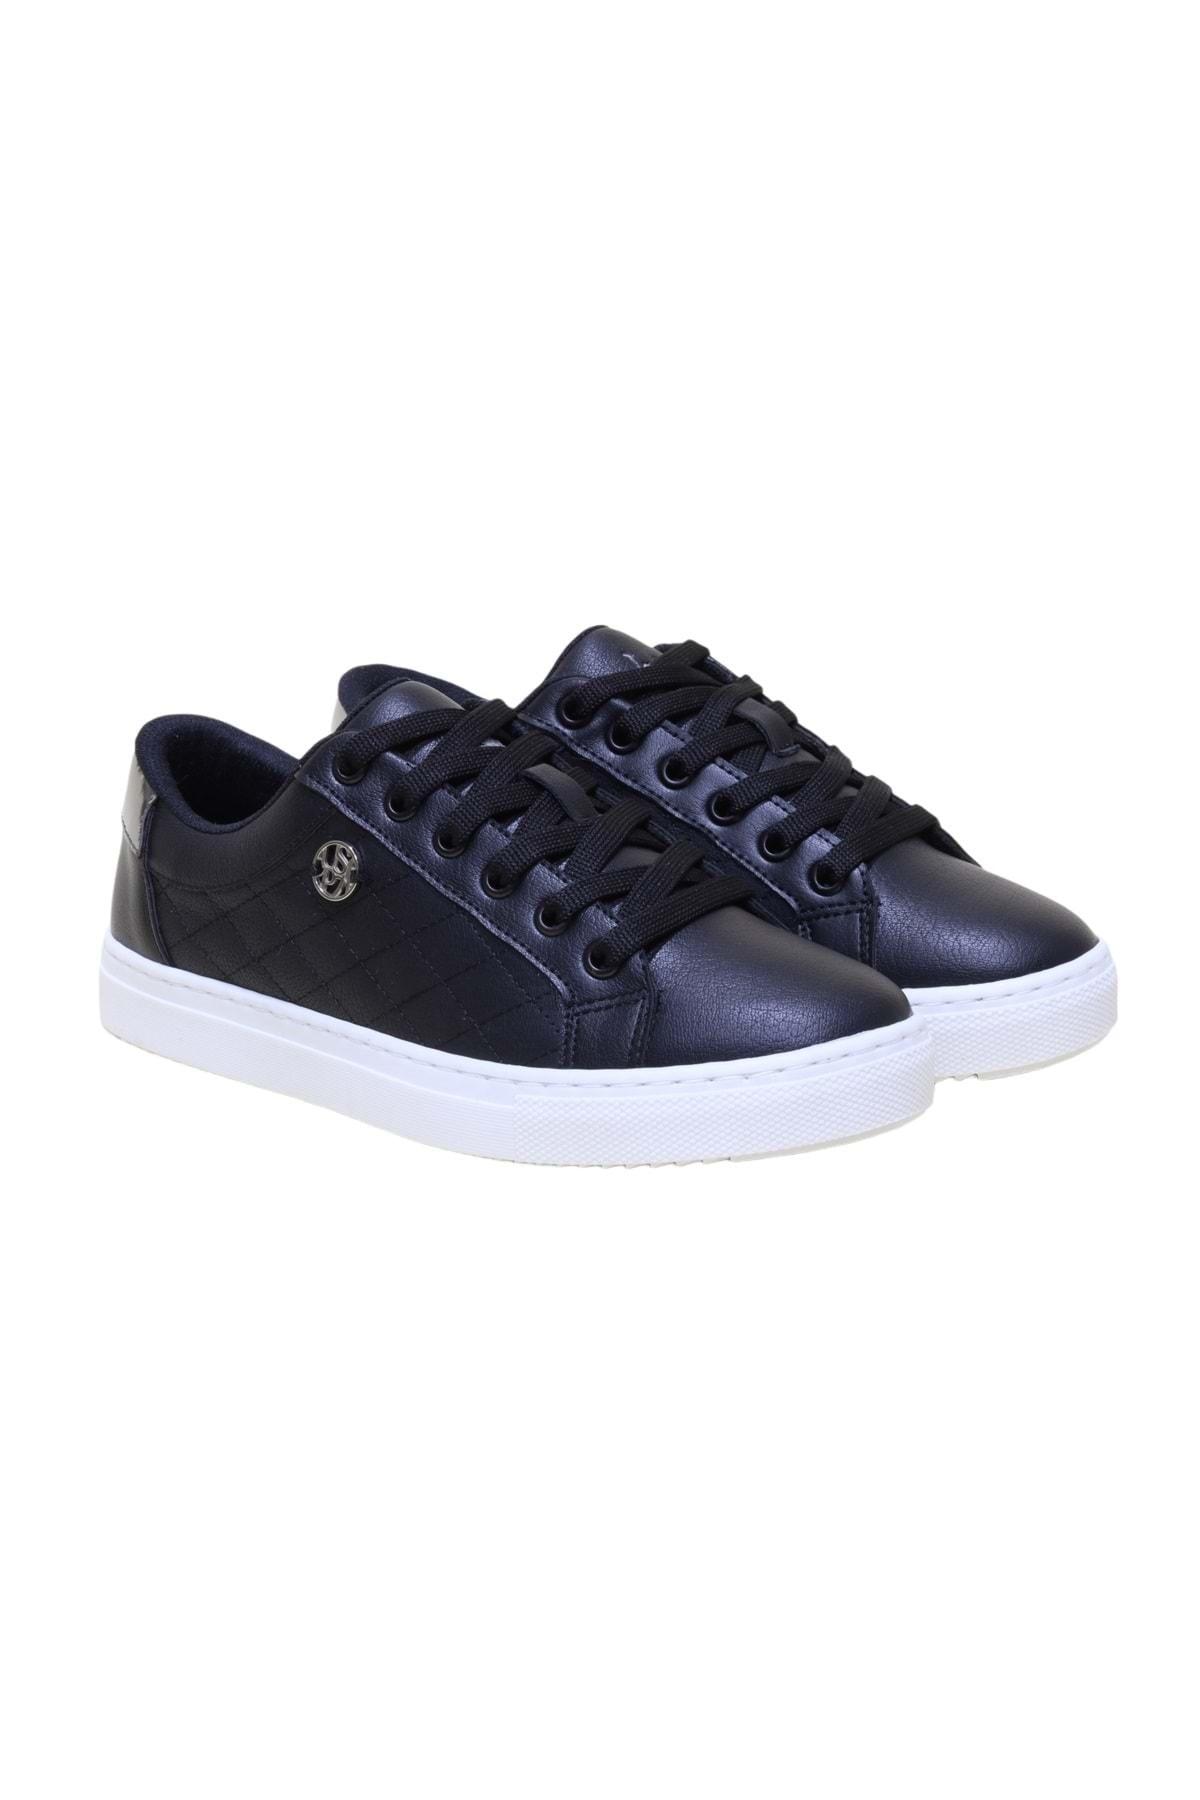 Tıggy Ortopedic Sneakers Bayan Ayakkabı - Siyah - 40